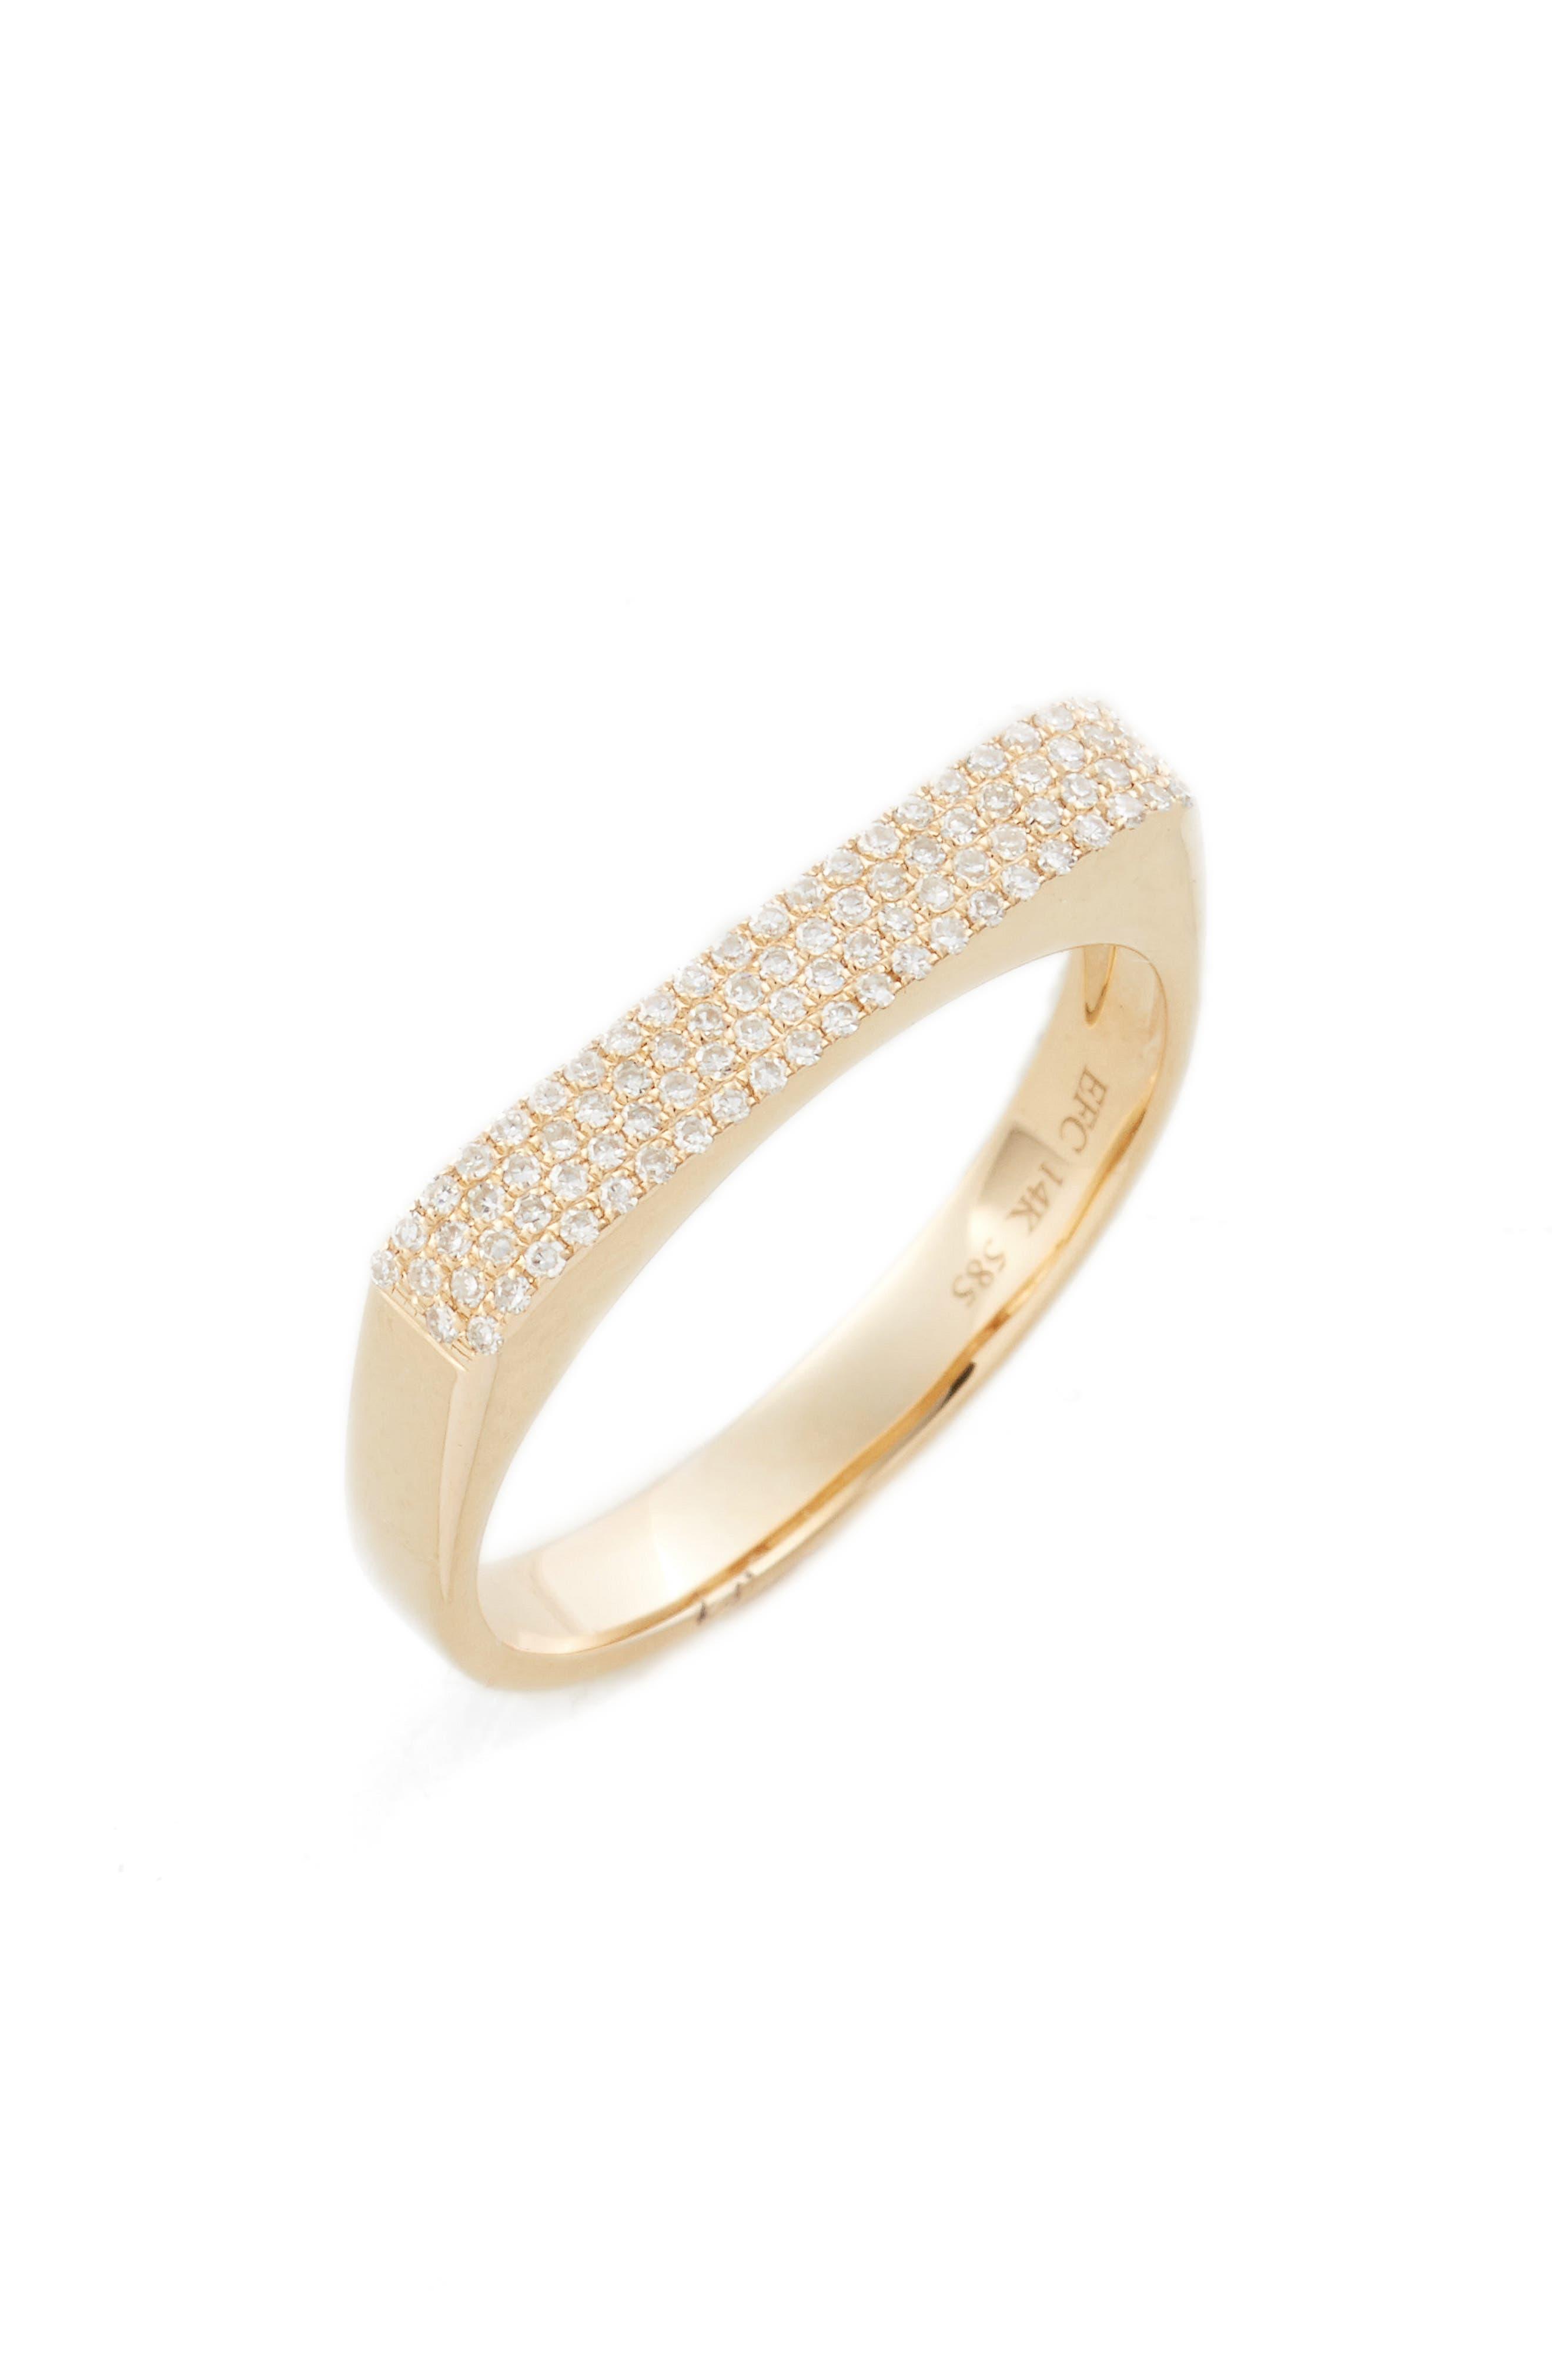 Jumbo Diamond Bar Ring,                             Main thumbnail 1, color,                             YELLOW GOLD